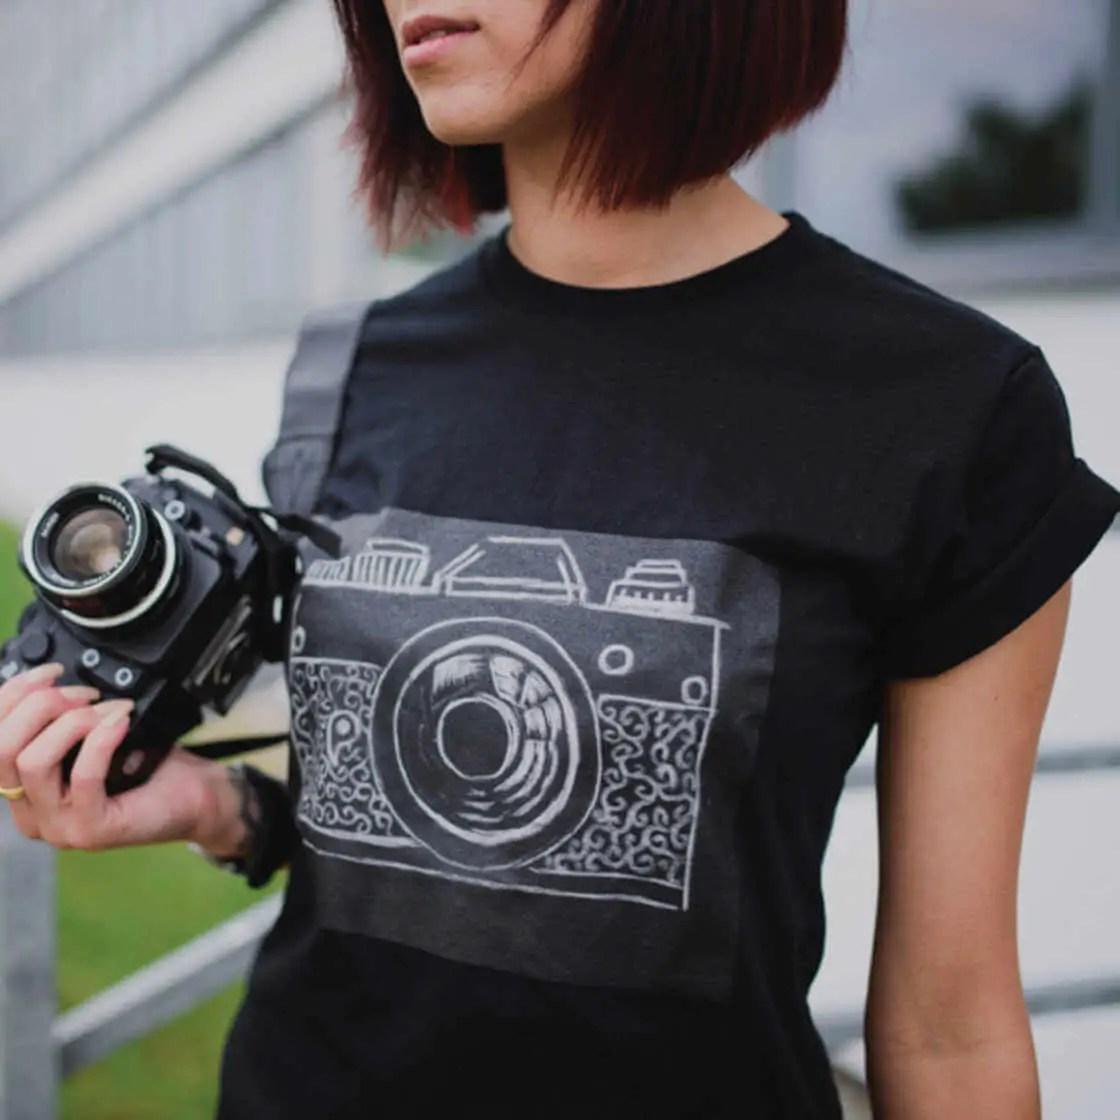 wersm-challky-blackboard-t-shirt-1